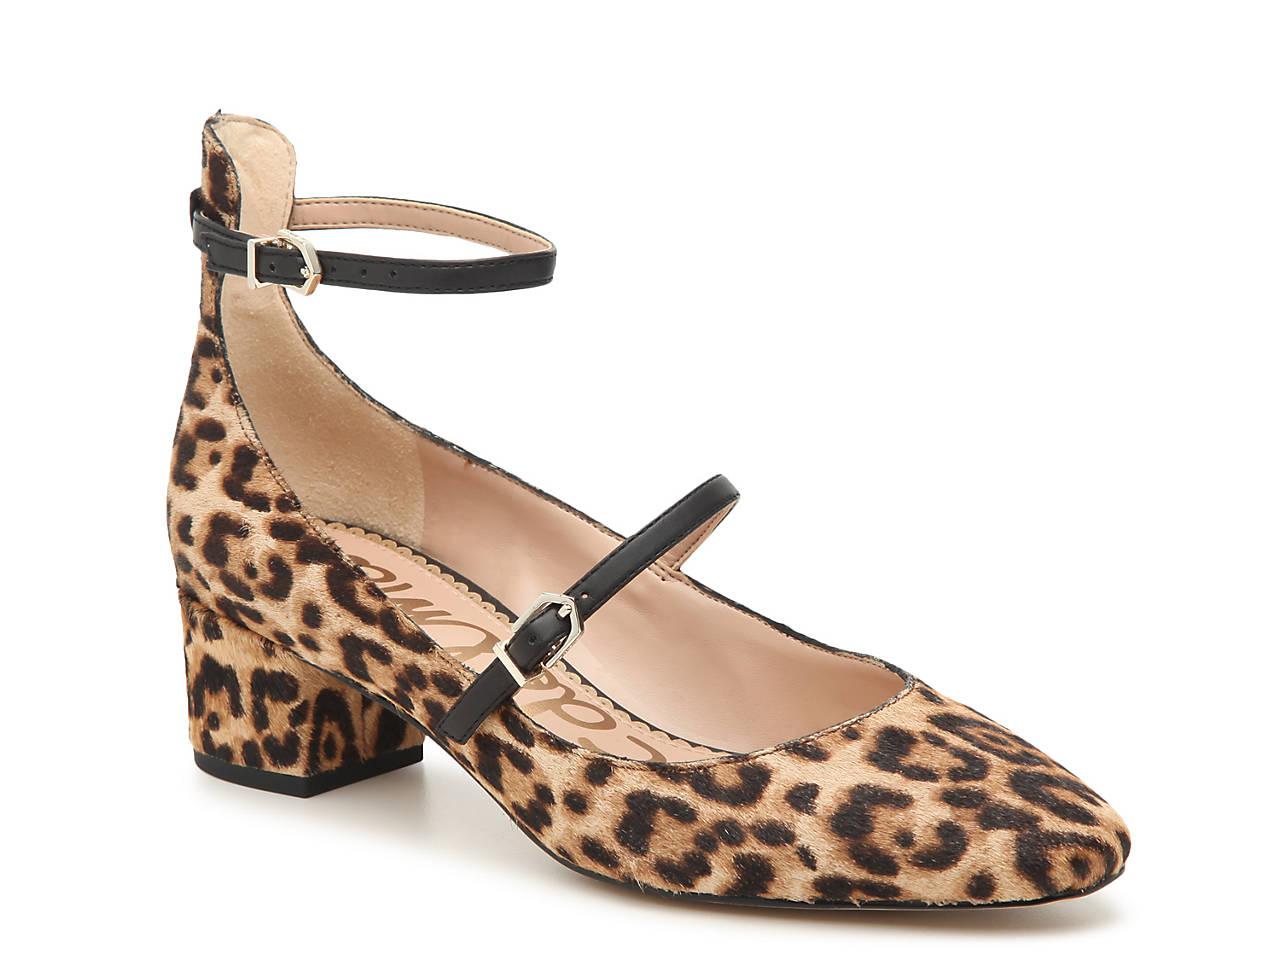 5995fbb43fc2 Sam Edelman Lulie Pump Women s Shoes